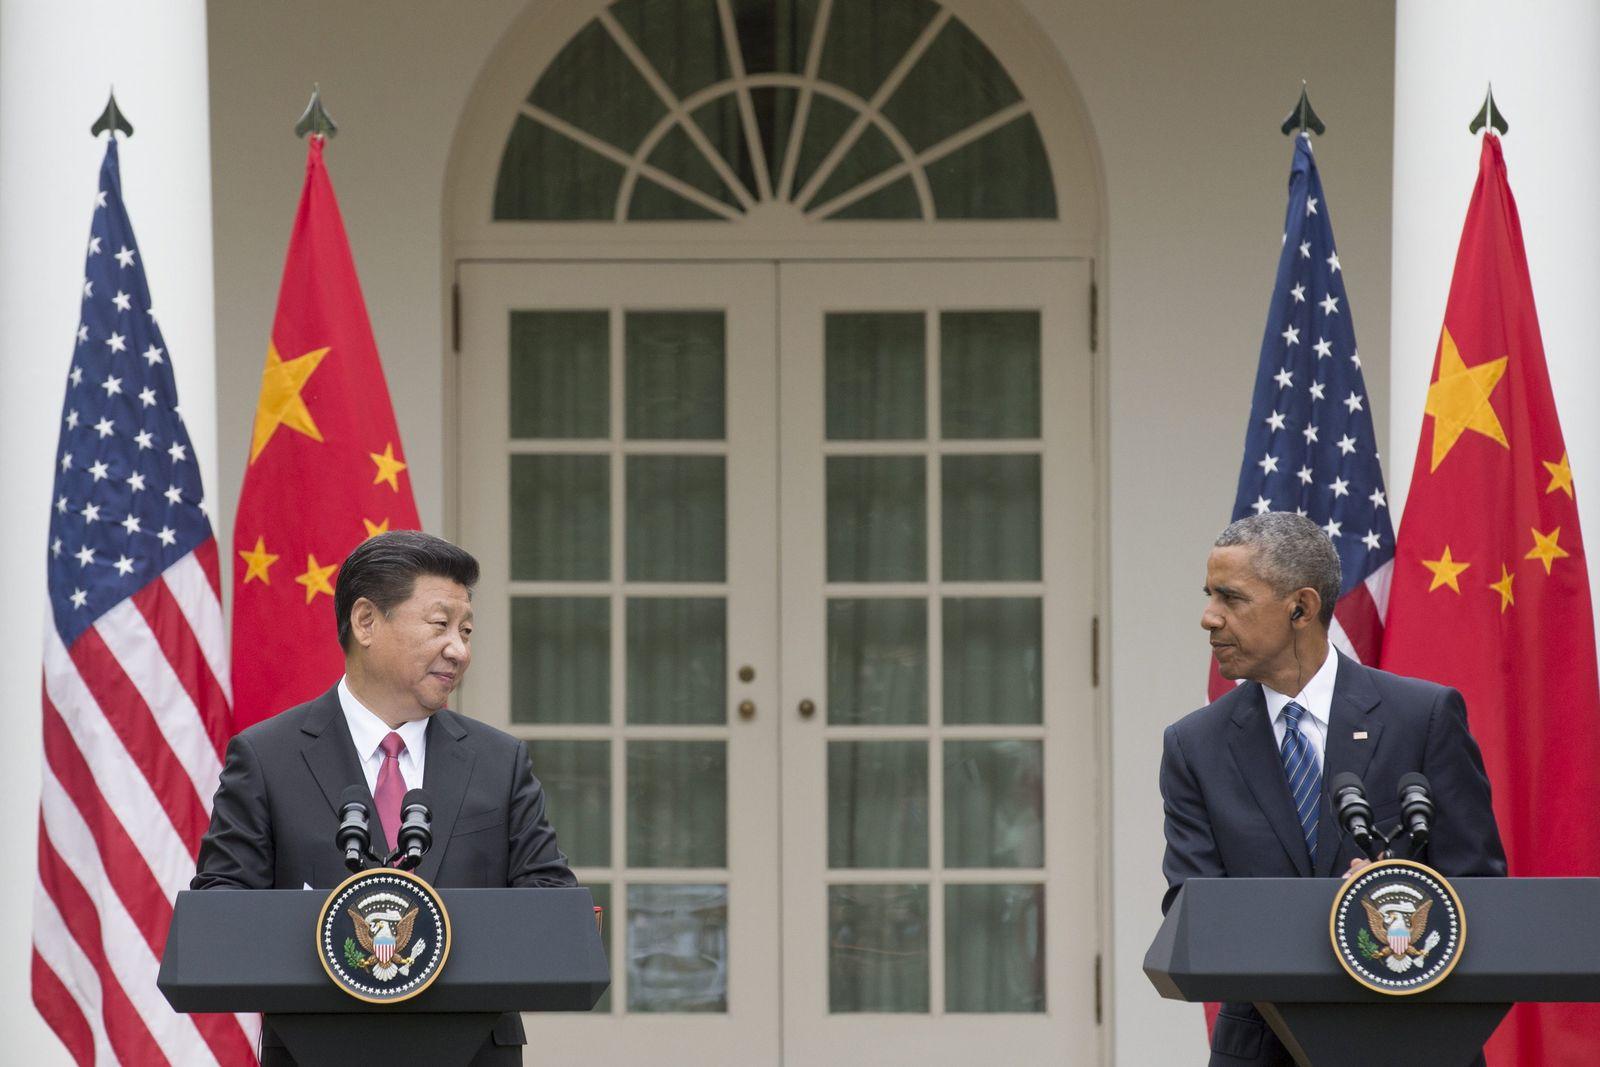 Xi Jinping / Barack Obama / Weißes Haus